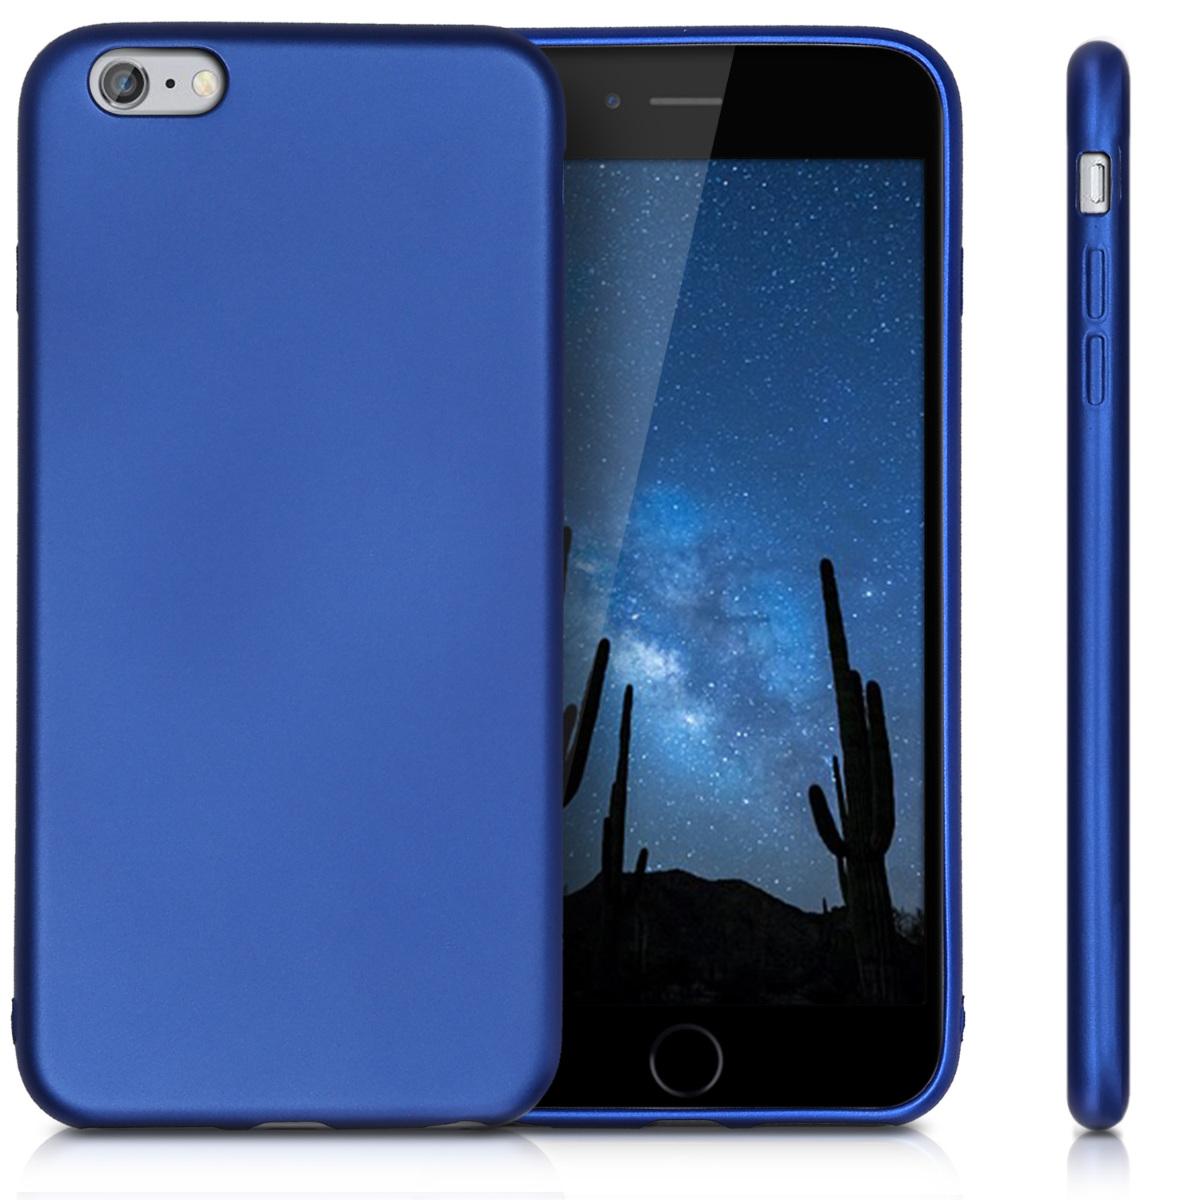 tpu silikon case f r apple iphone 6 plus 6s plus cover. Black Bedroom Furniture Sets. Home Design Ideas